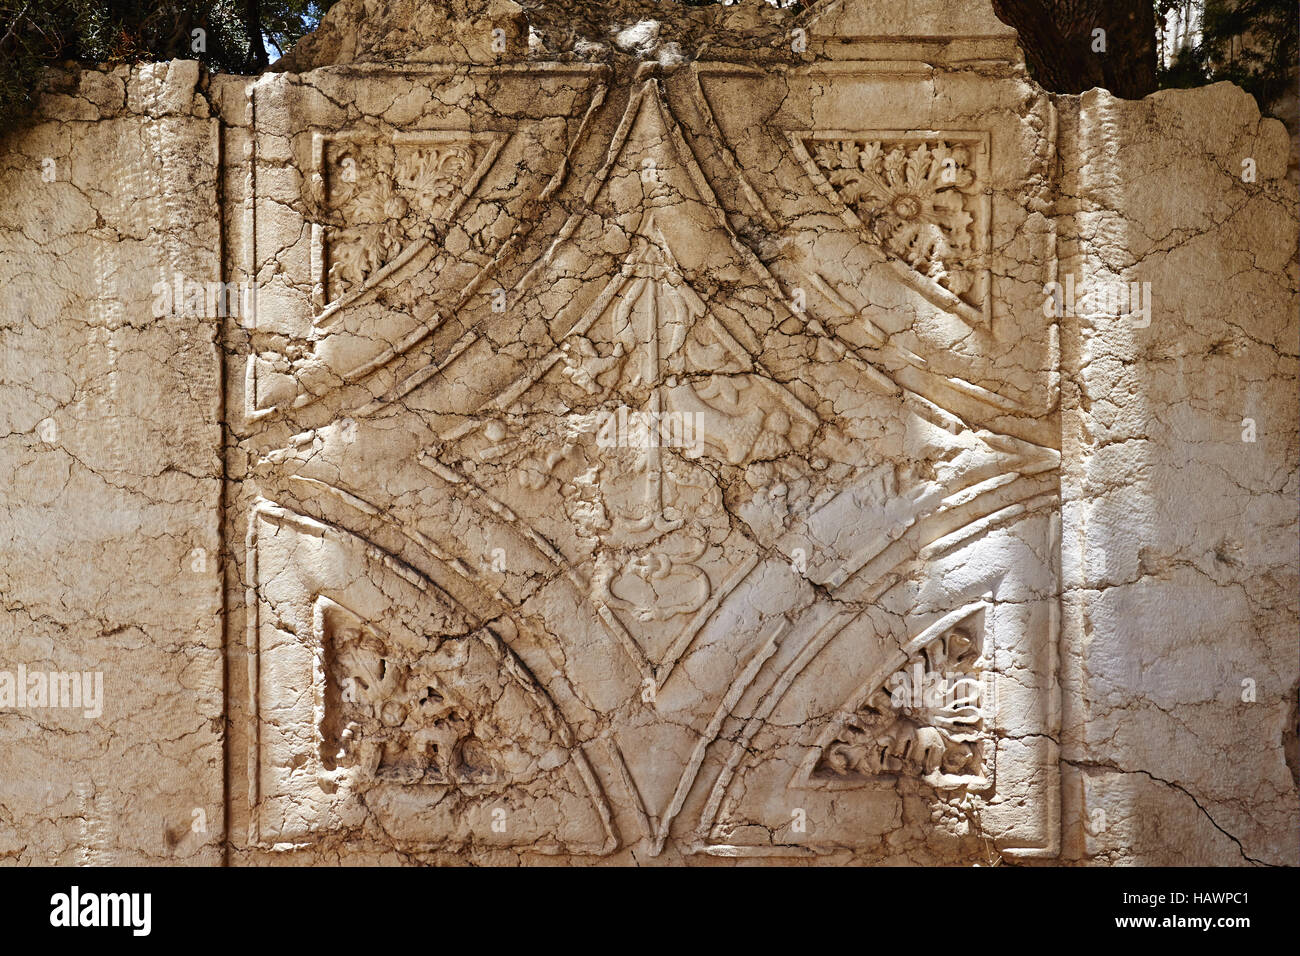 Museum at Baalbek temples - Baalbek, Lebanon - Stock Image